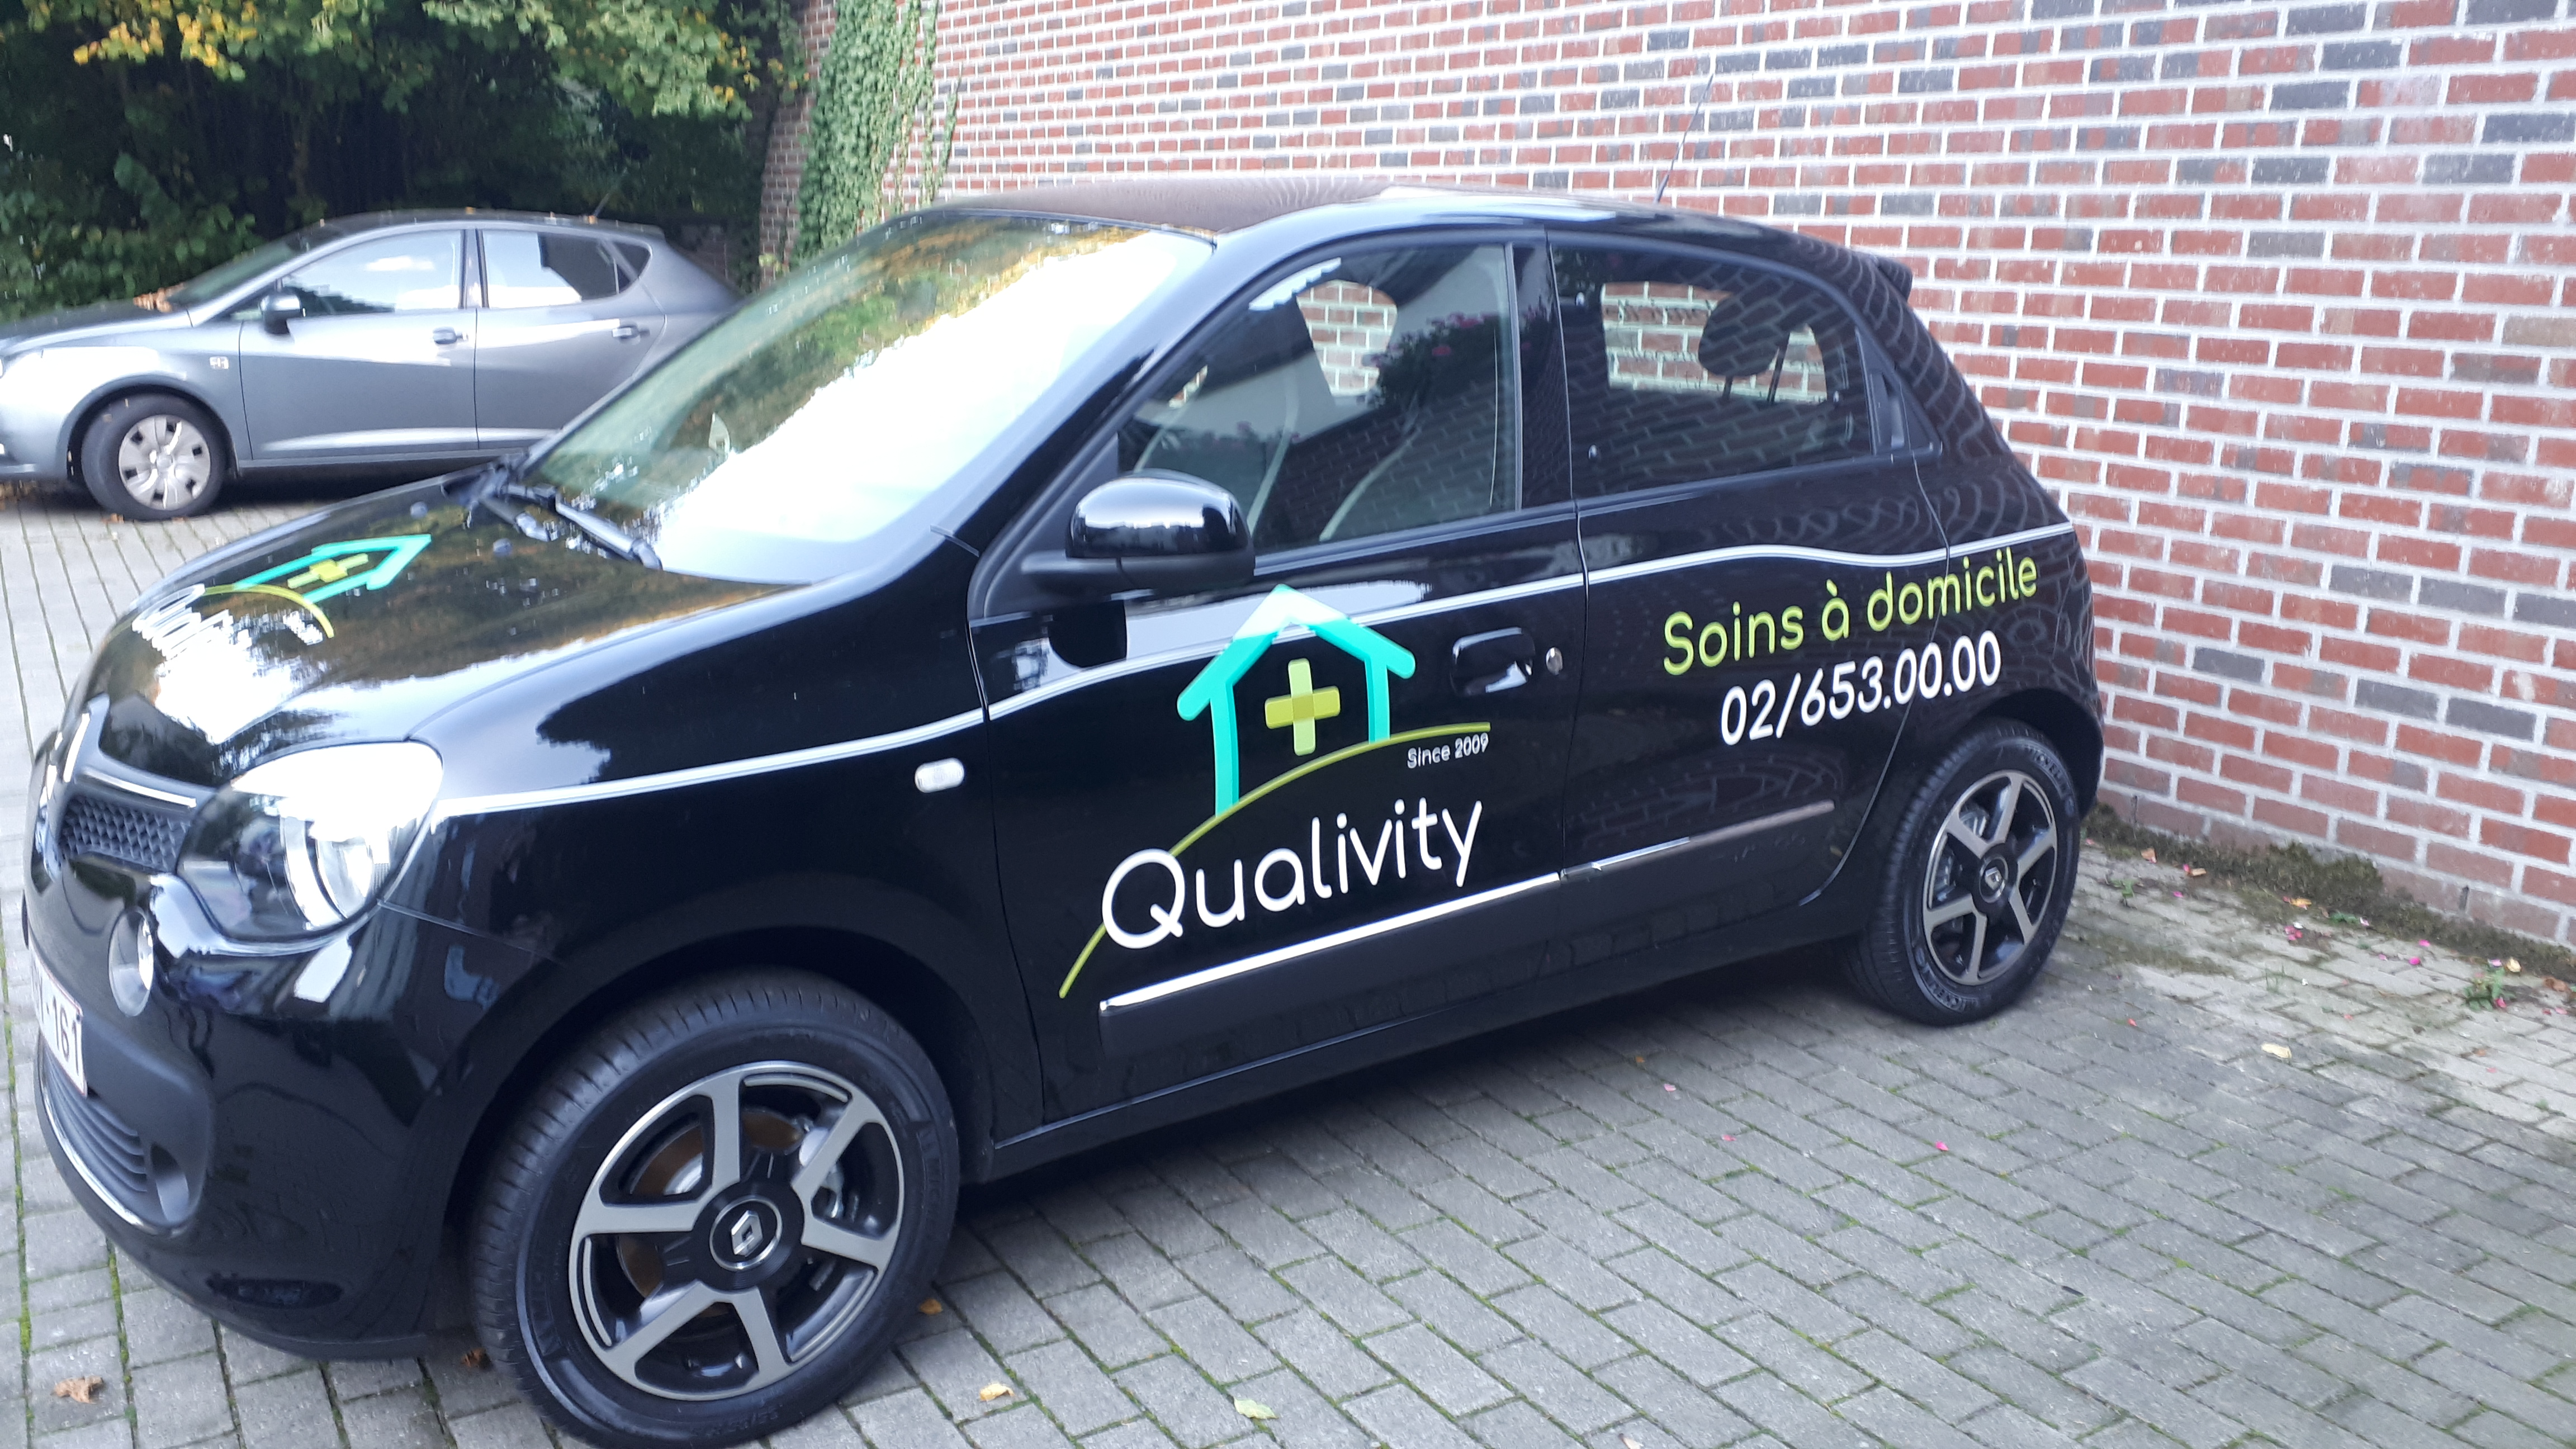 Qualivity Car Covering